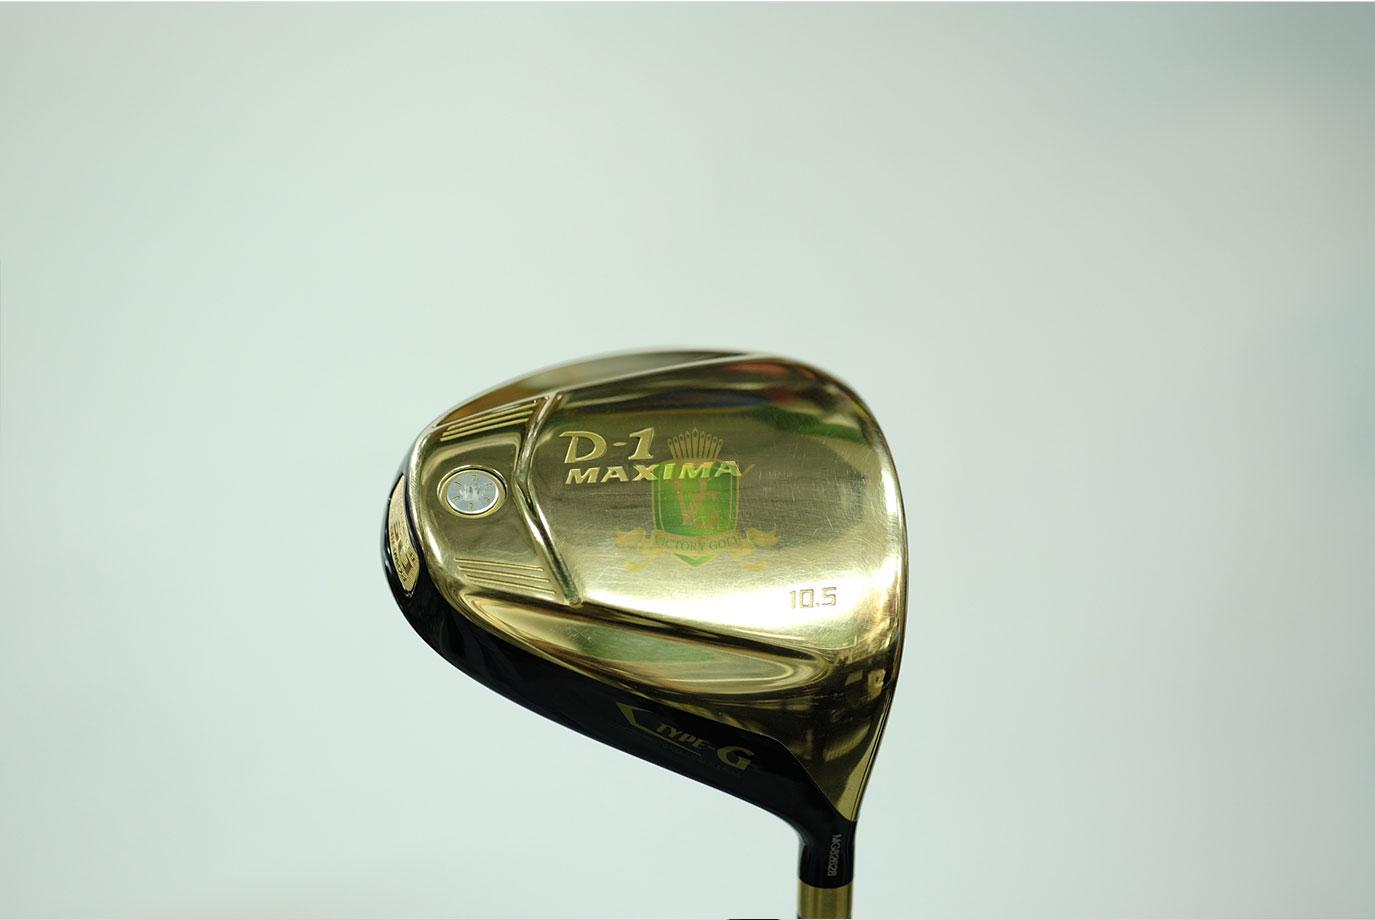 D.Ryoma -MX- 10.5*(S)59g.46.5''/D2/303g./CPM236